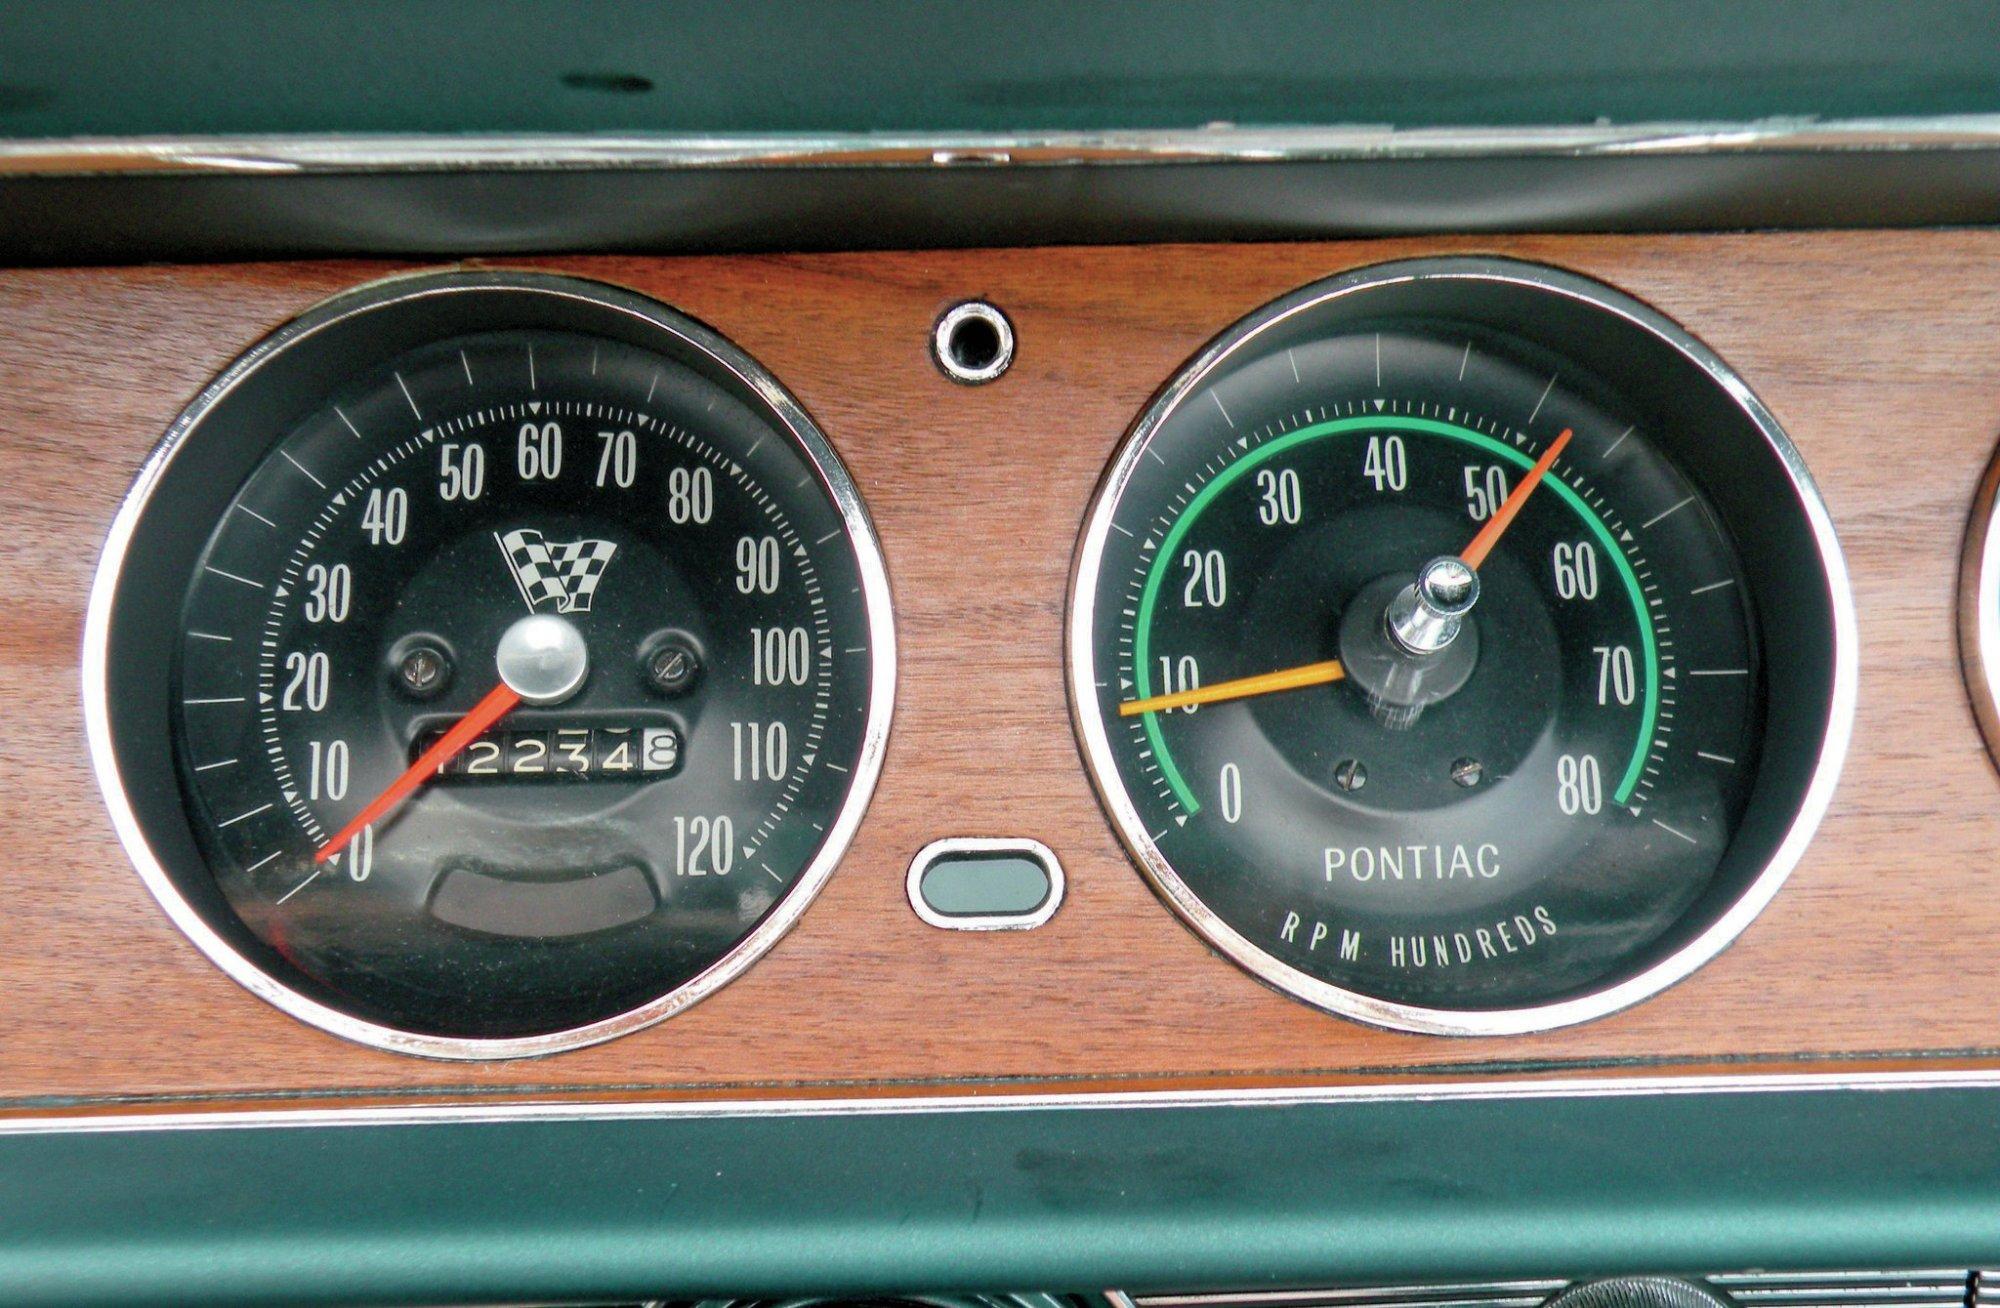 hight resolution of repairing a 1965 1967 gto tach hot rod network pontiac grand prix wiring diagrams 1965 pontiac 1965 pontiac gto rally gauge